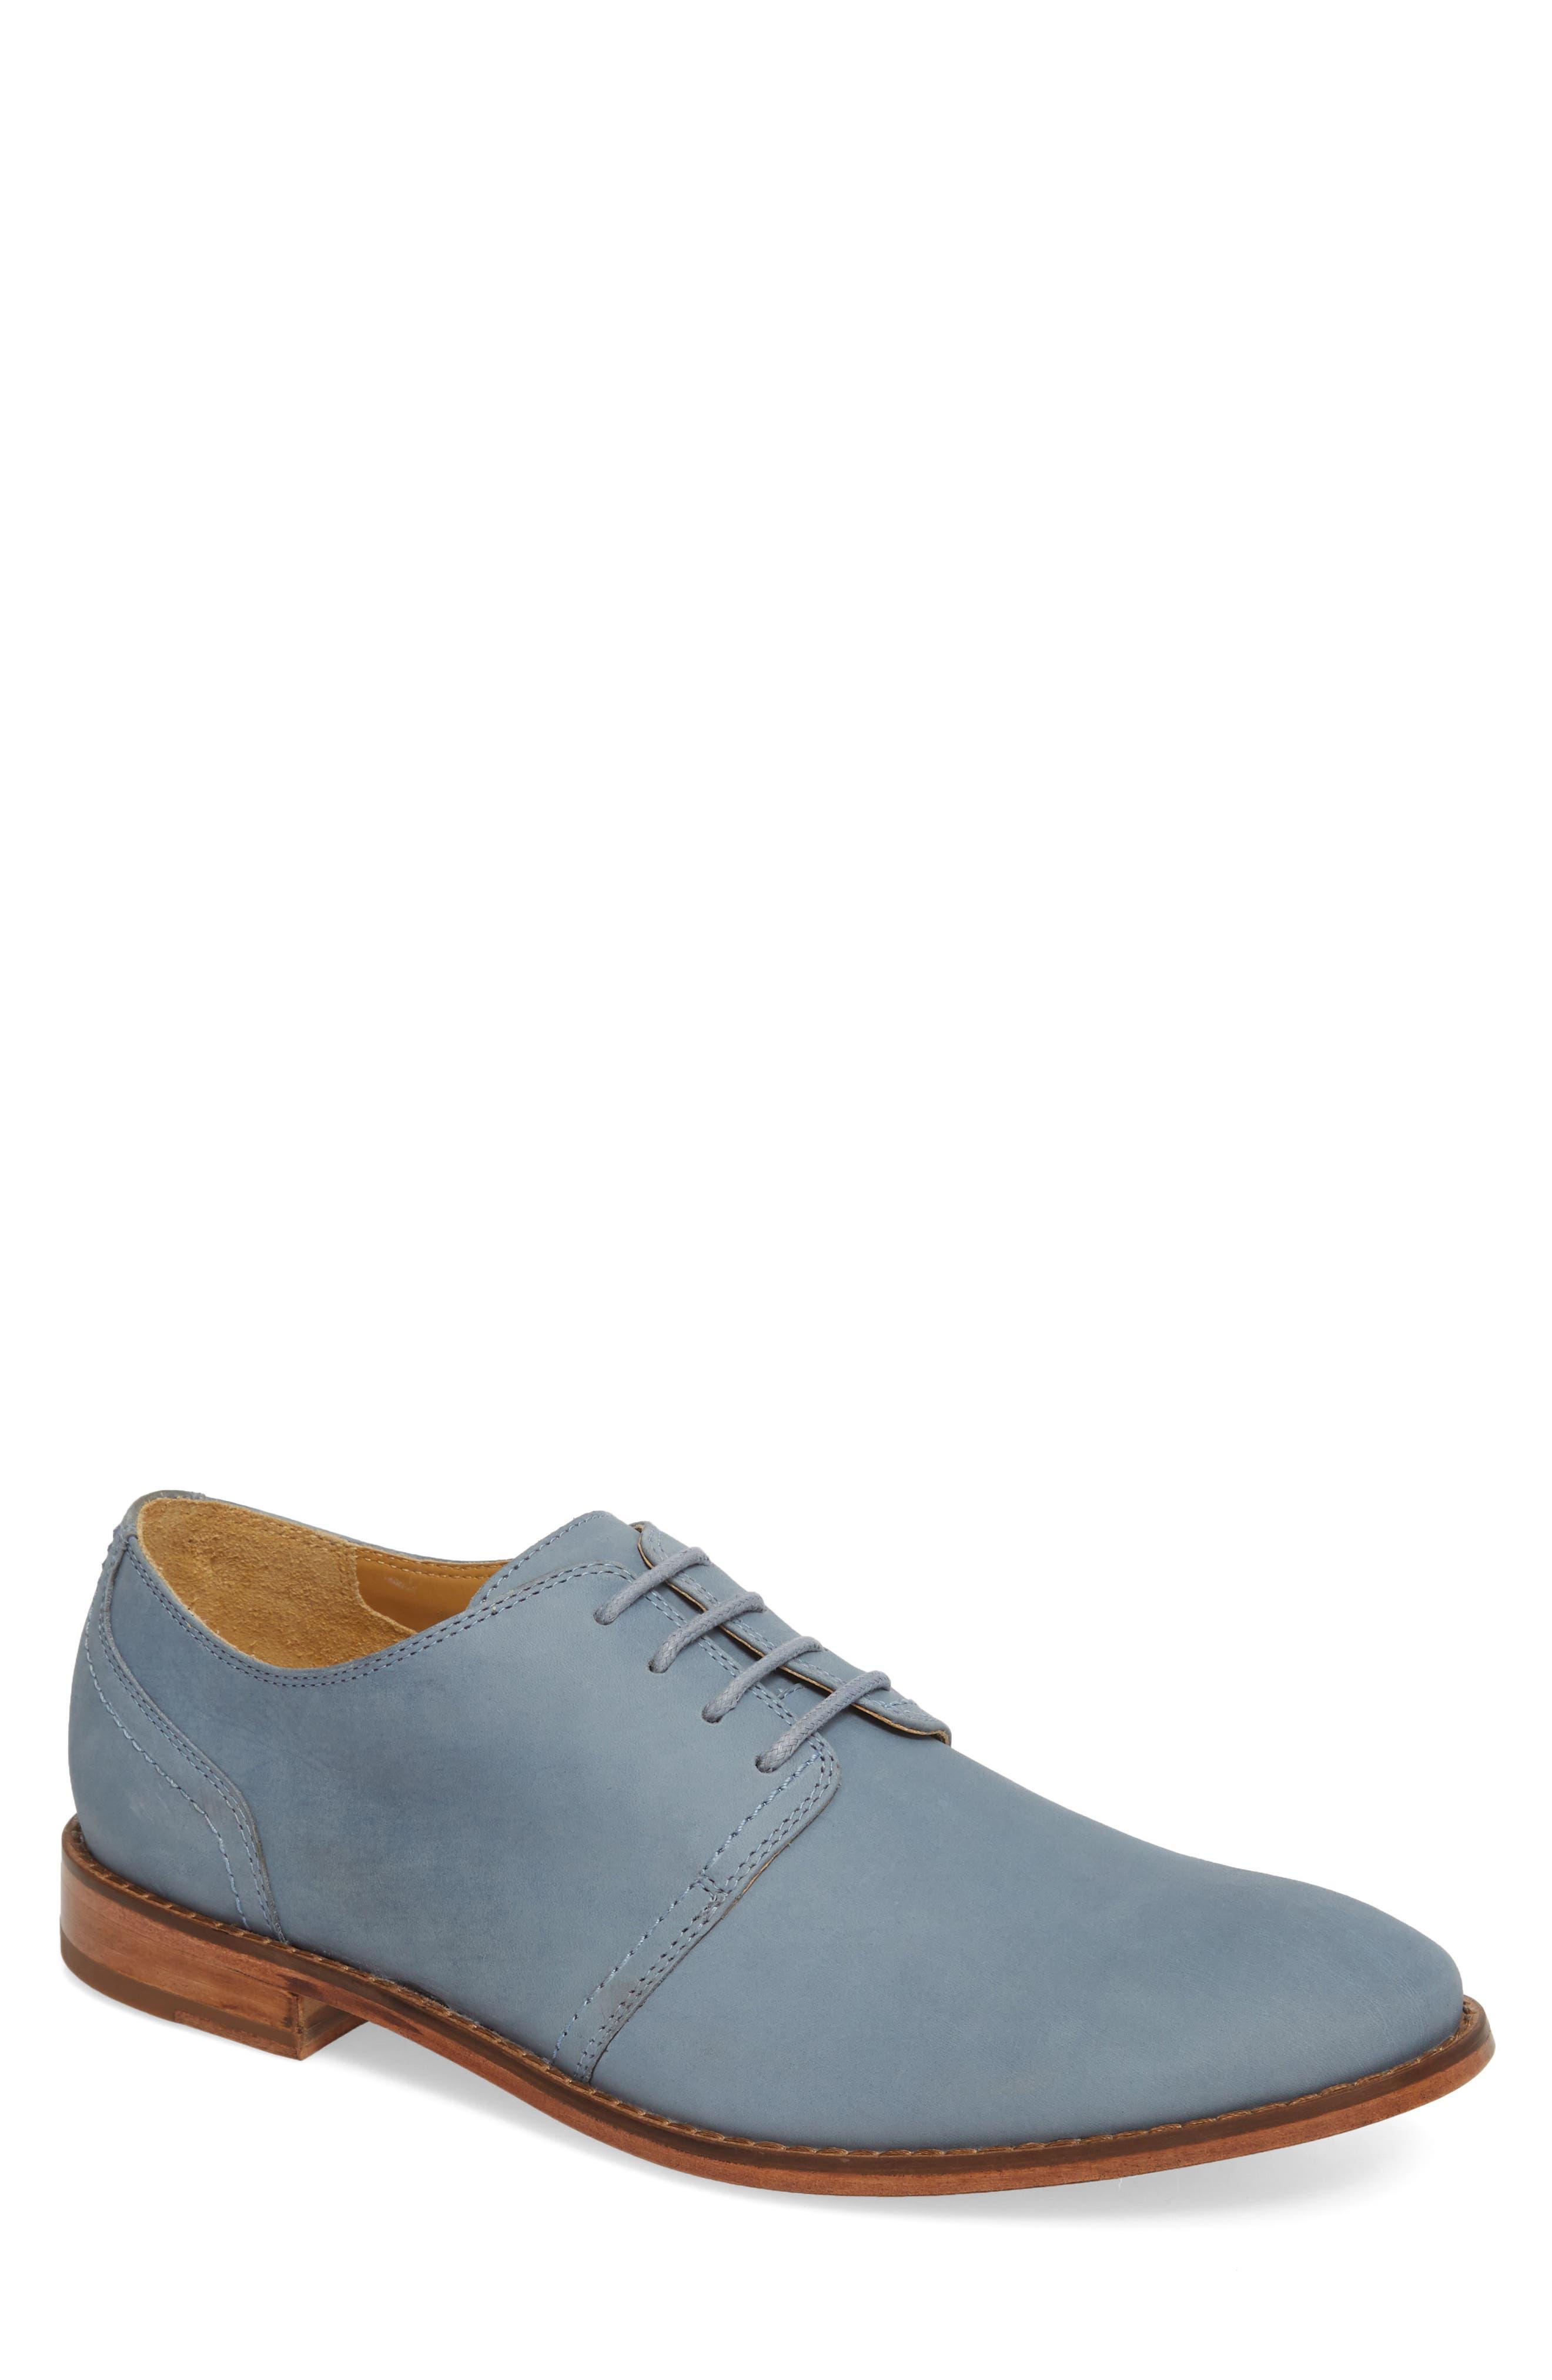 Caan Plain Toe Derby,                         Main,                         color, Flint Stone Leather